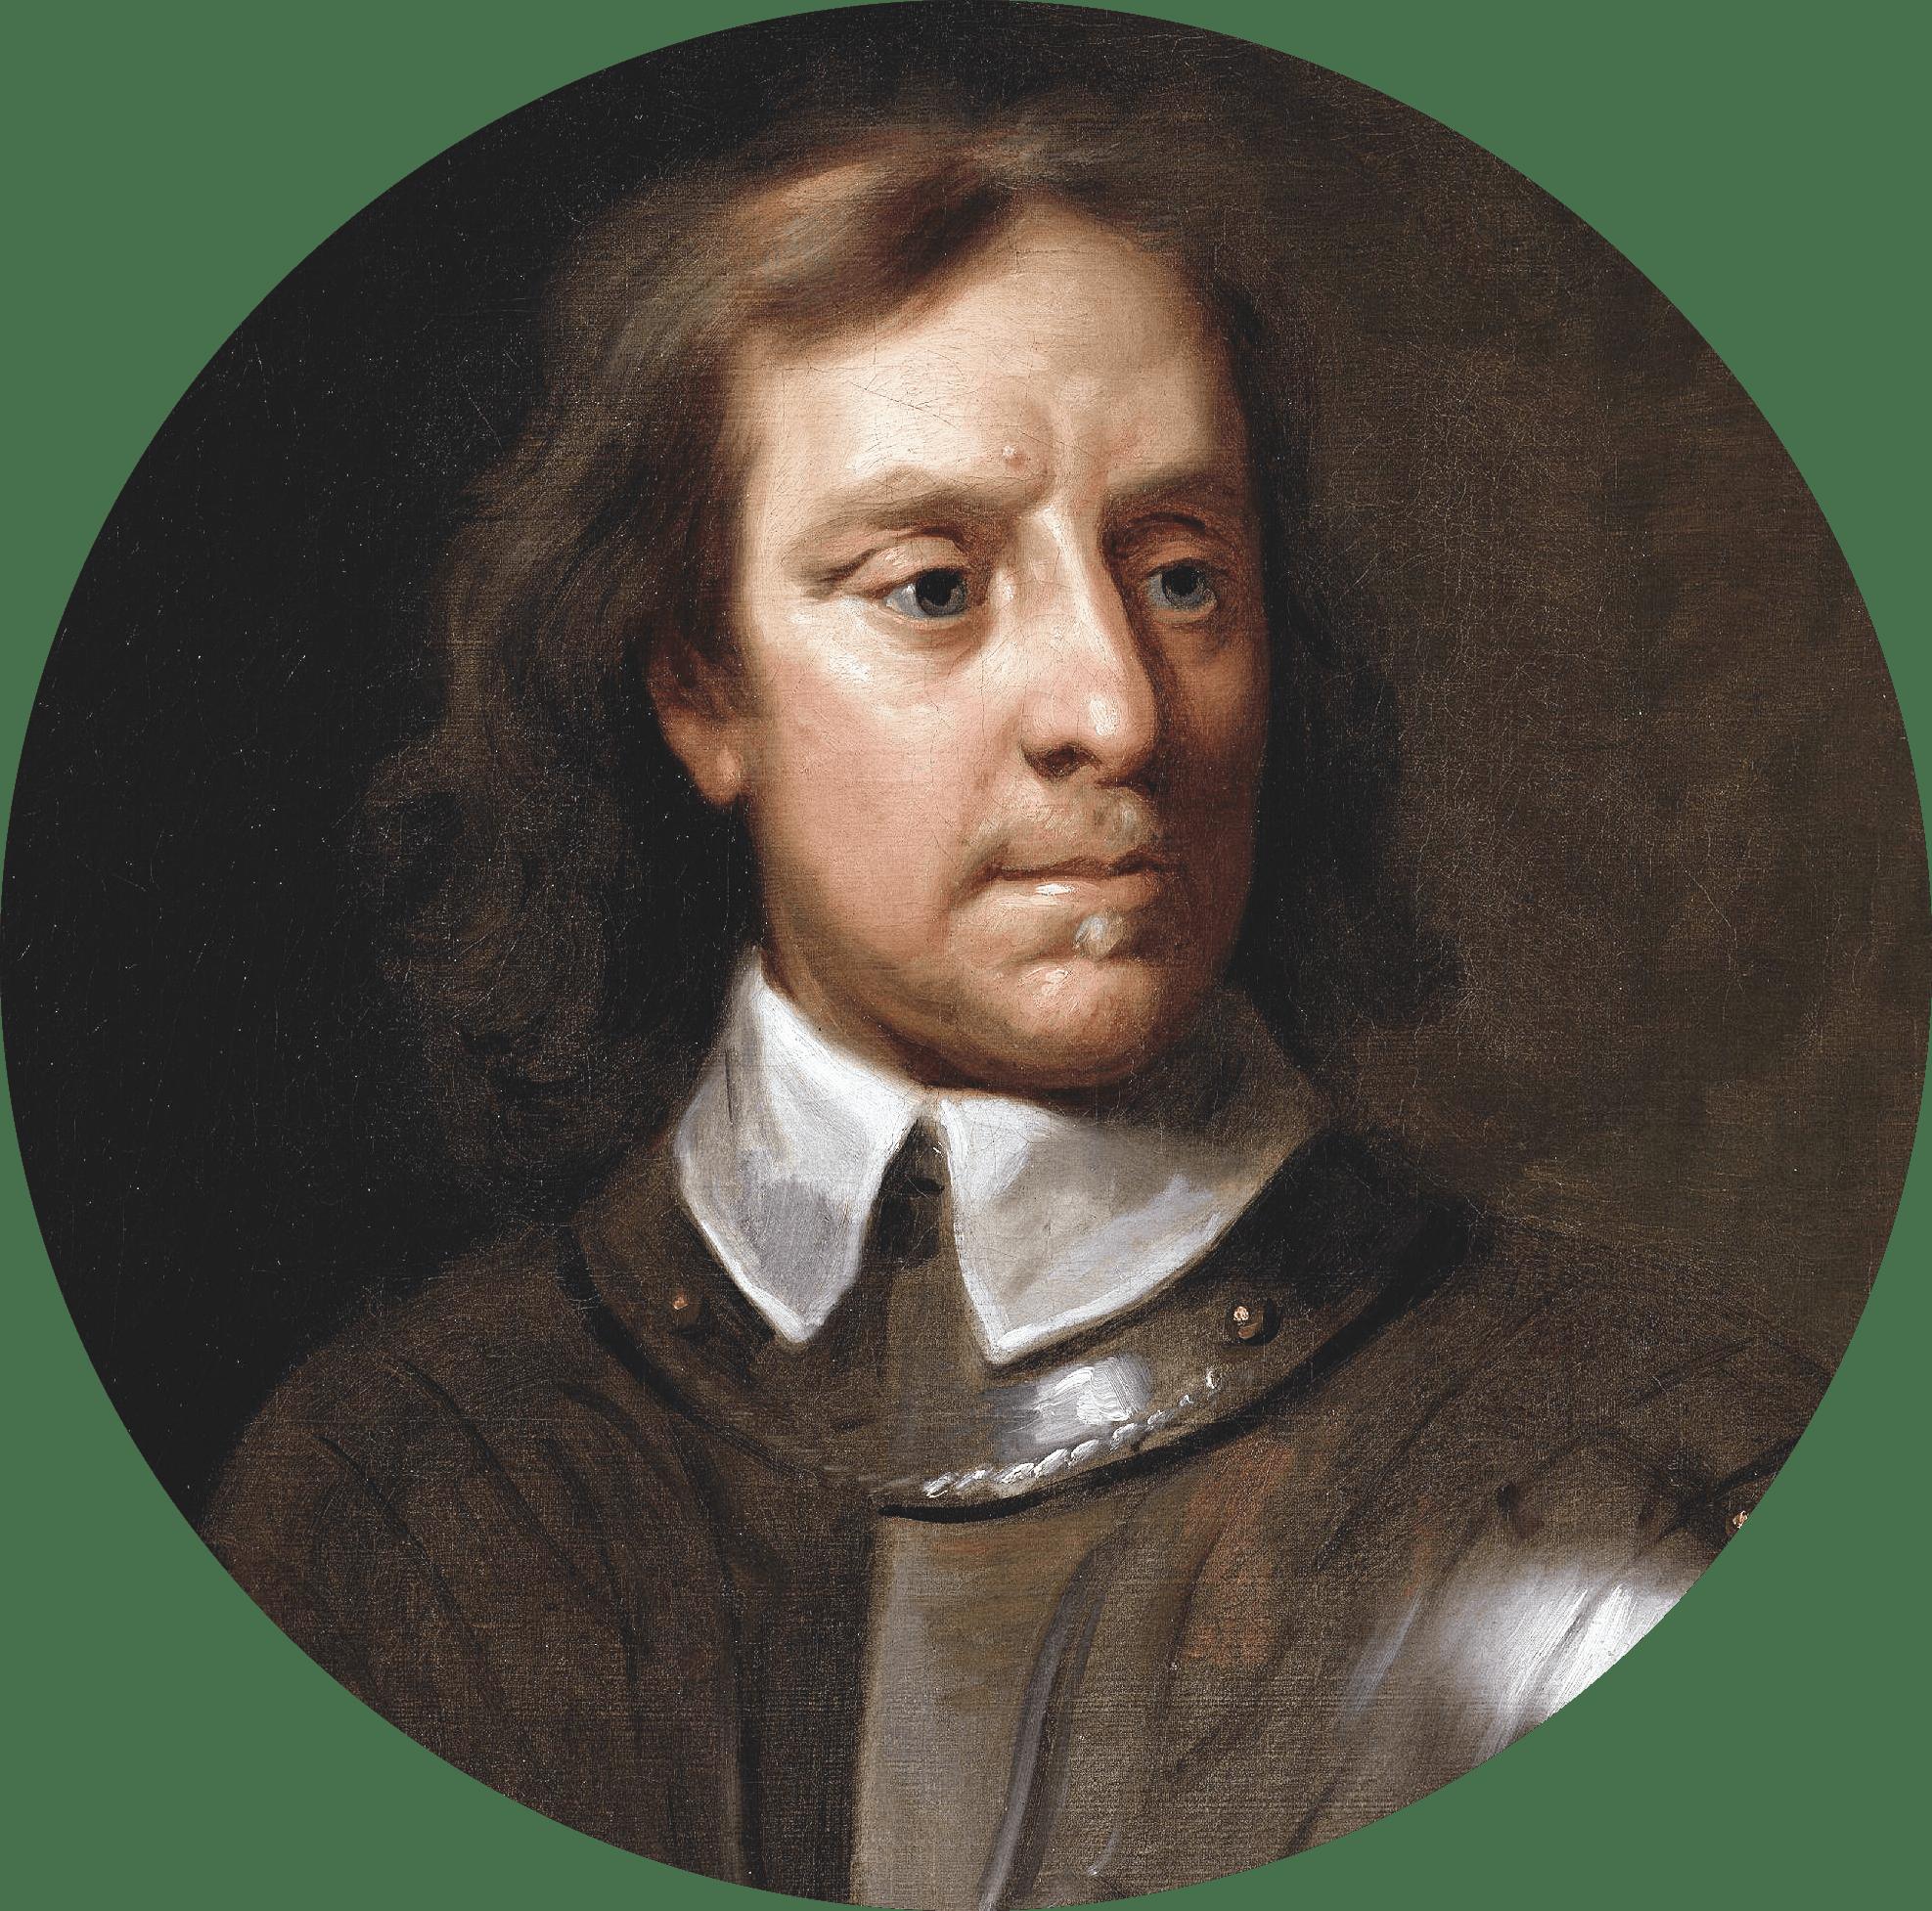 Olivier Cromwell